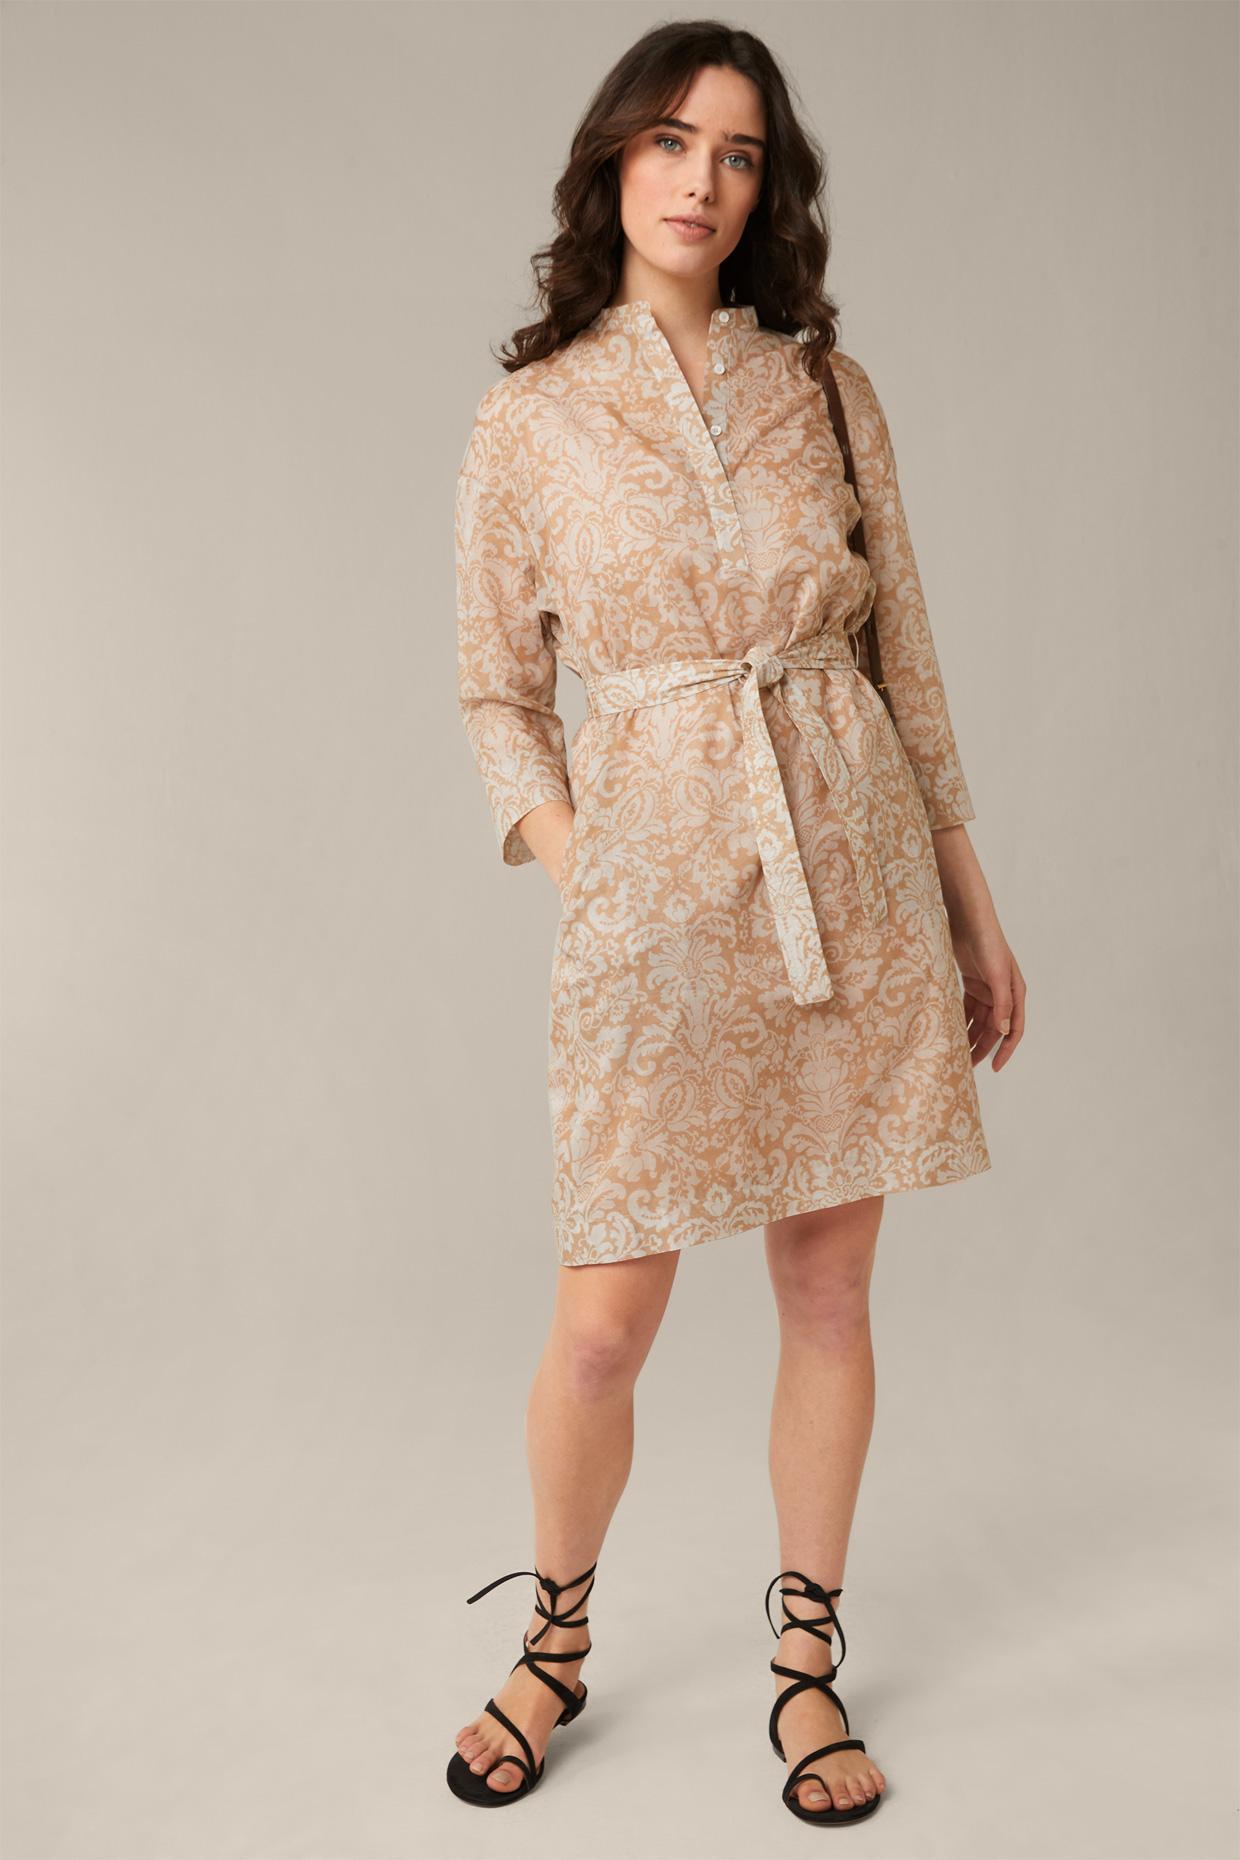 Batiste Fabric dress